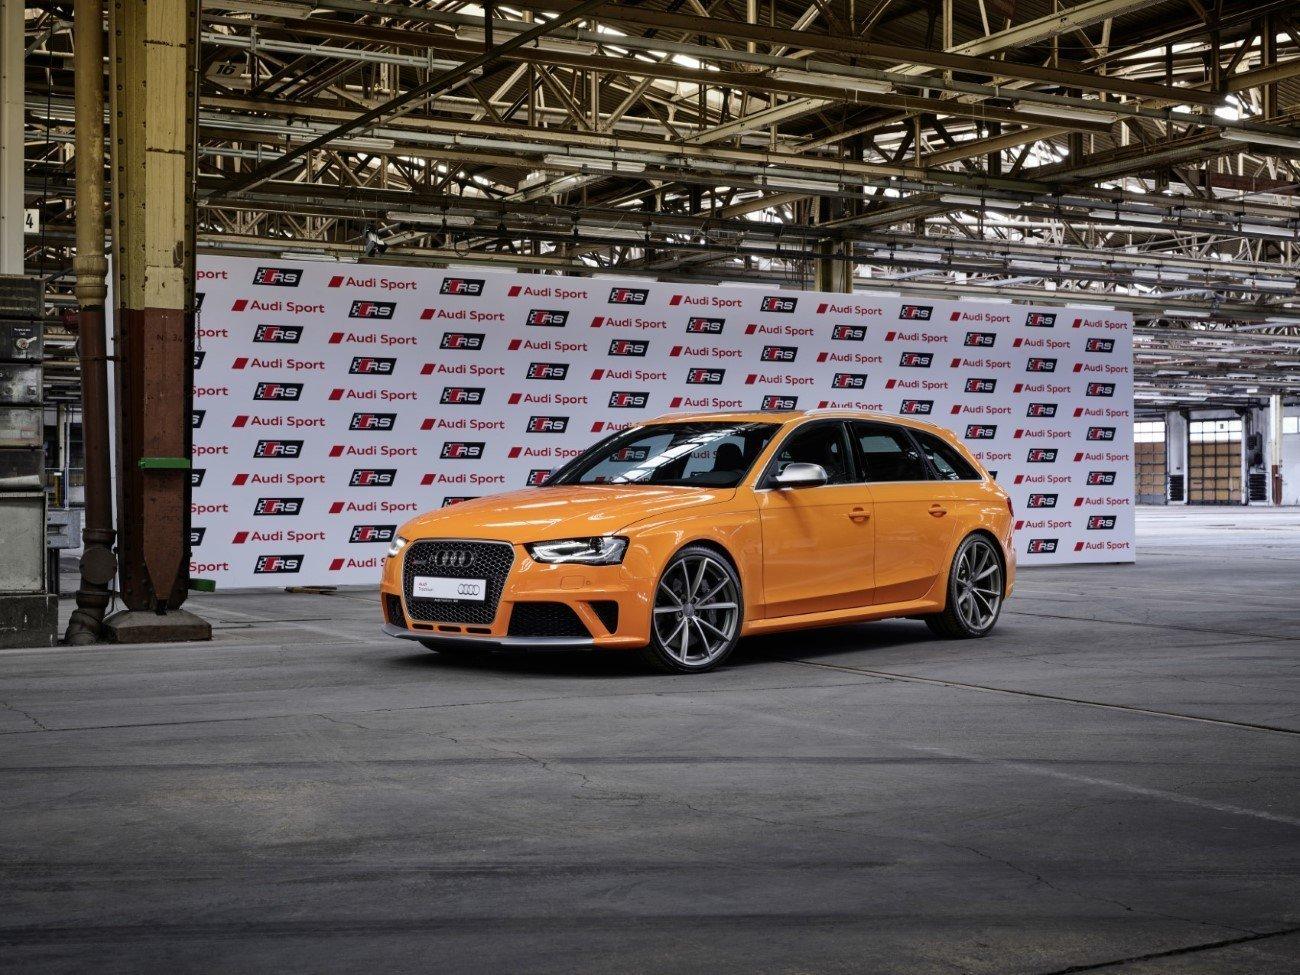 Audi RS 4 Avant (Typ B8), glutorange